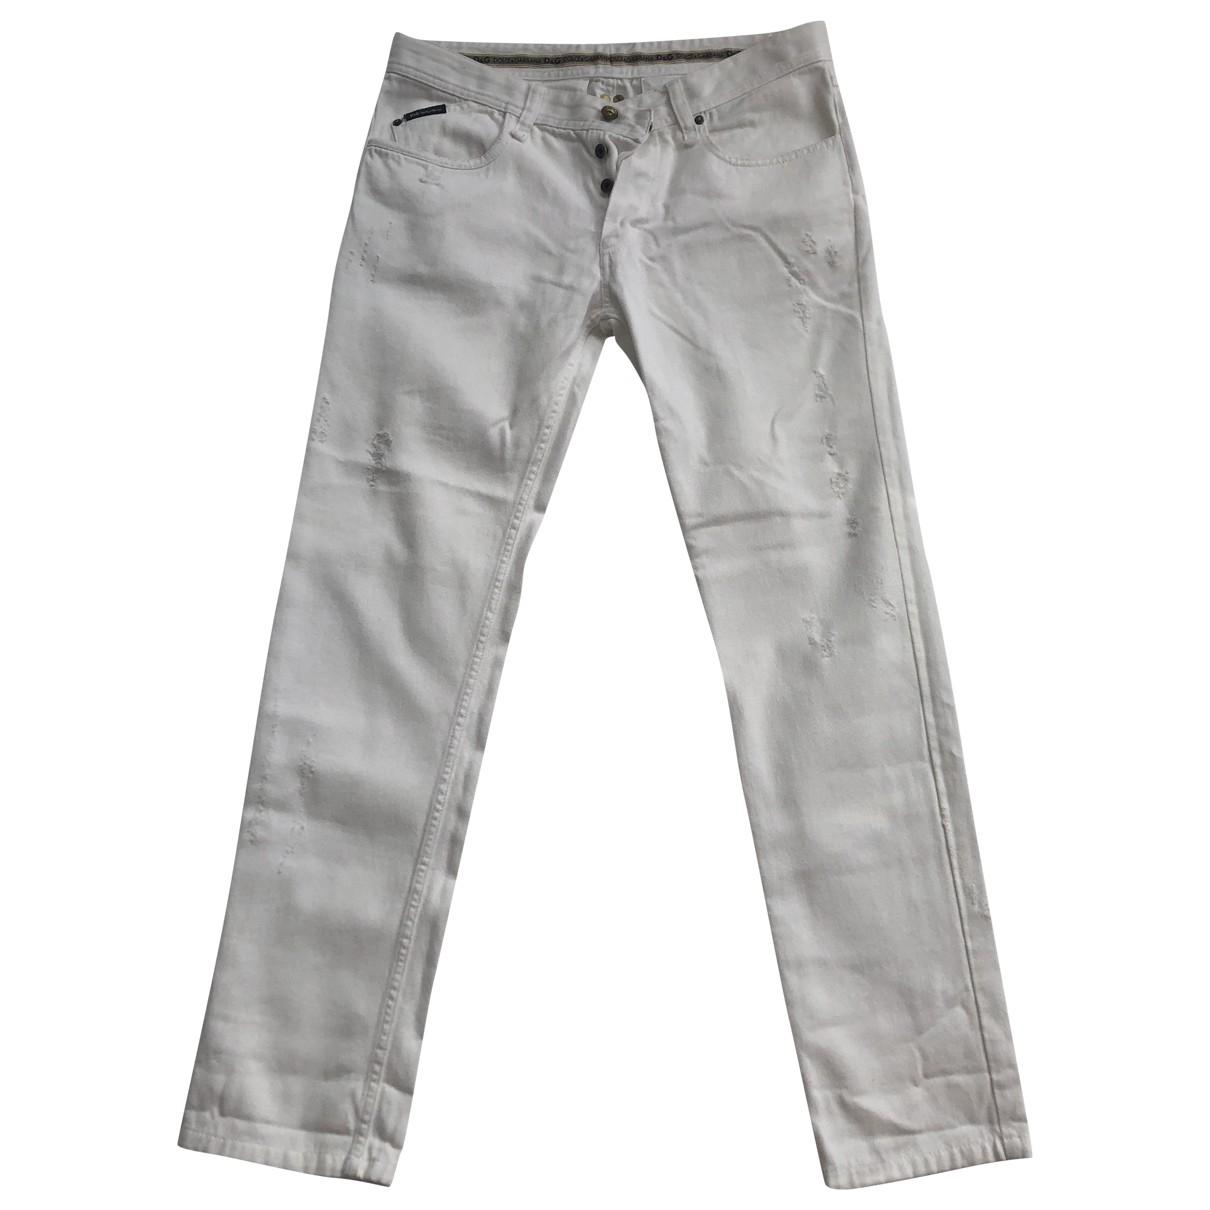 D&g \N White Cotton Jeans for Men 34 US